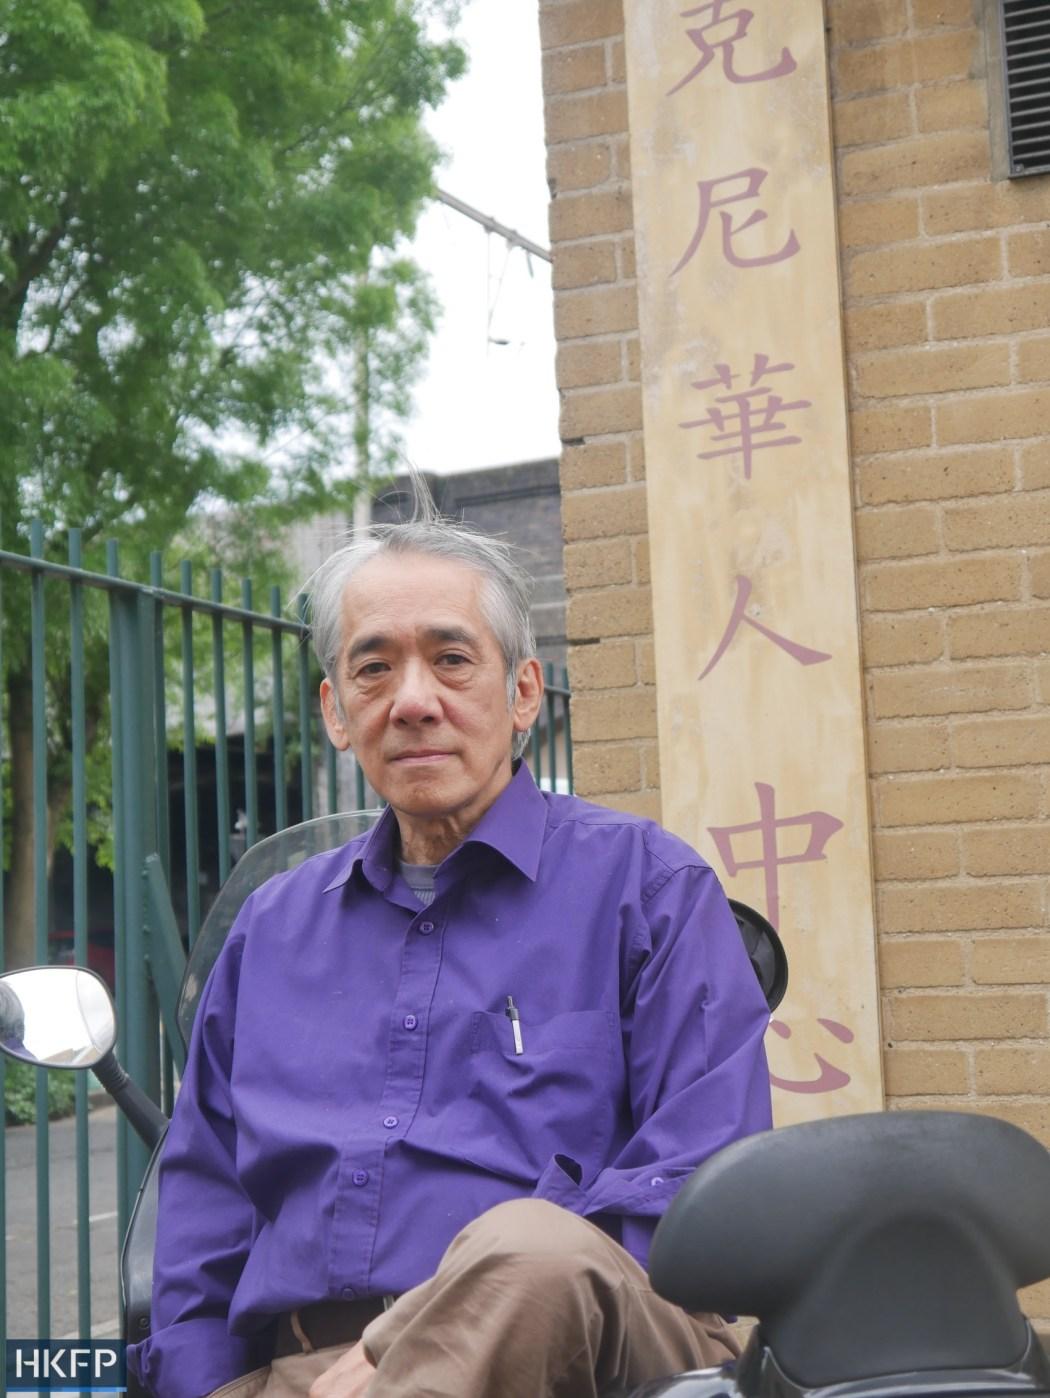 Jabez-Lam-of-Hackney-Chinese-Community-Centre-Copy